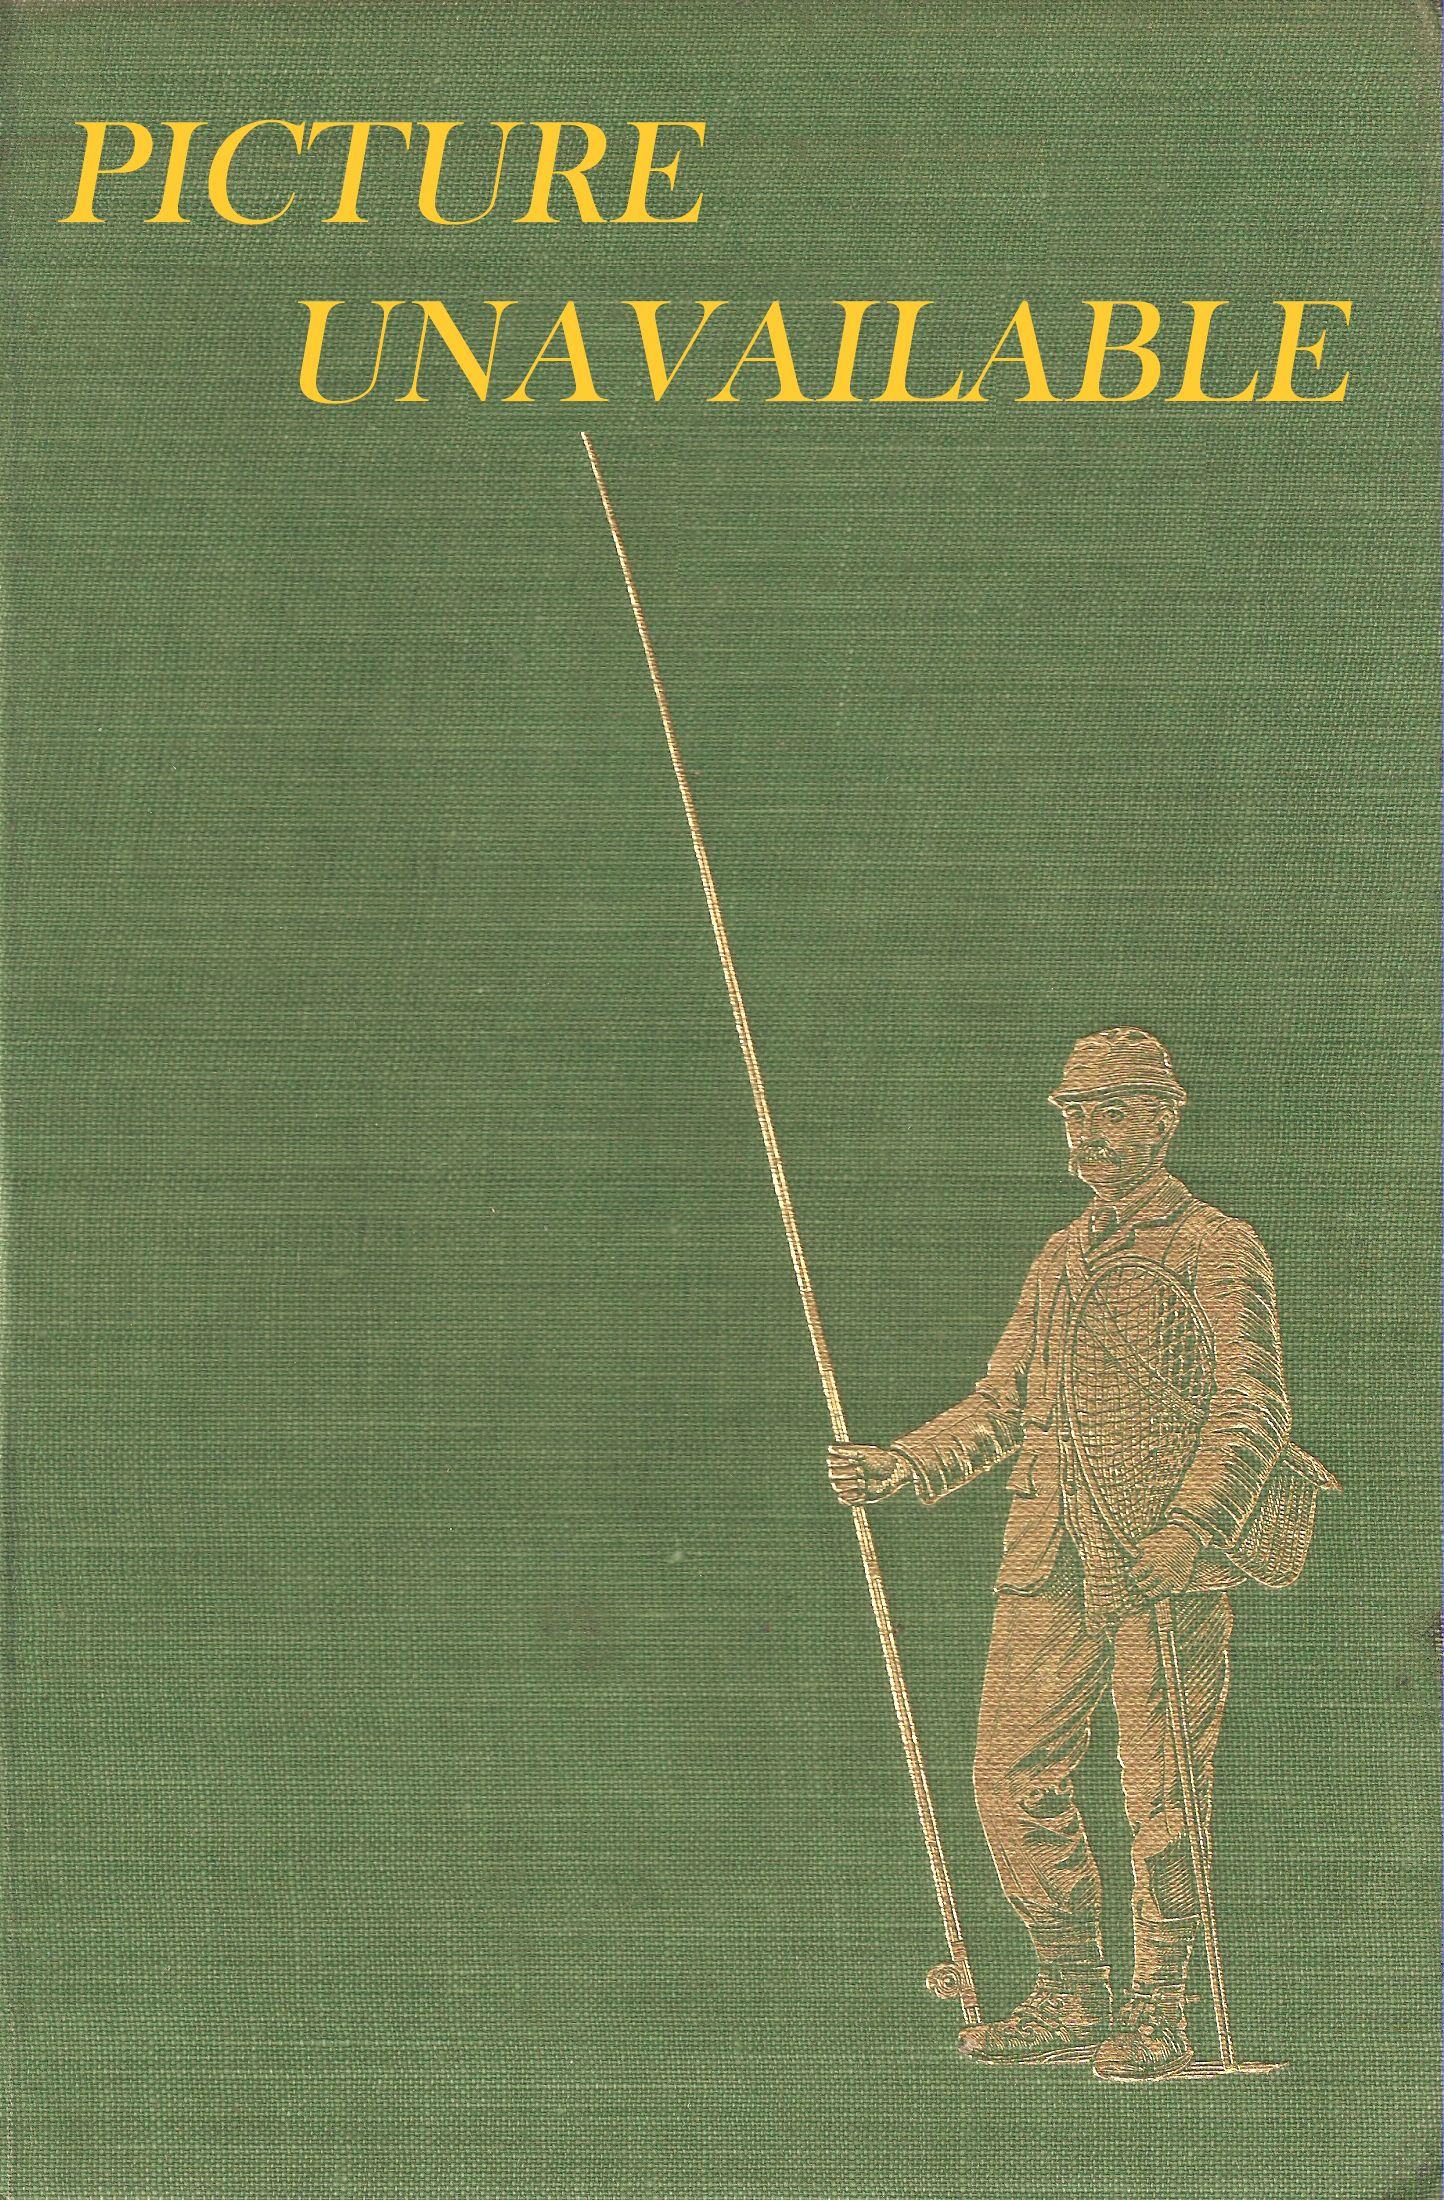 JOHN JAMES AUDUBON: A BIOGRAPHY. By Alexander B. Adams.